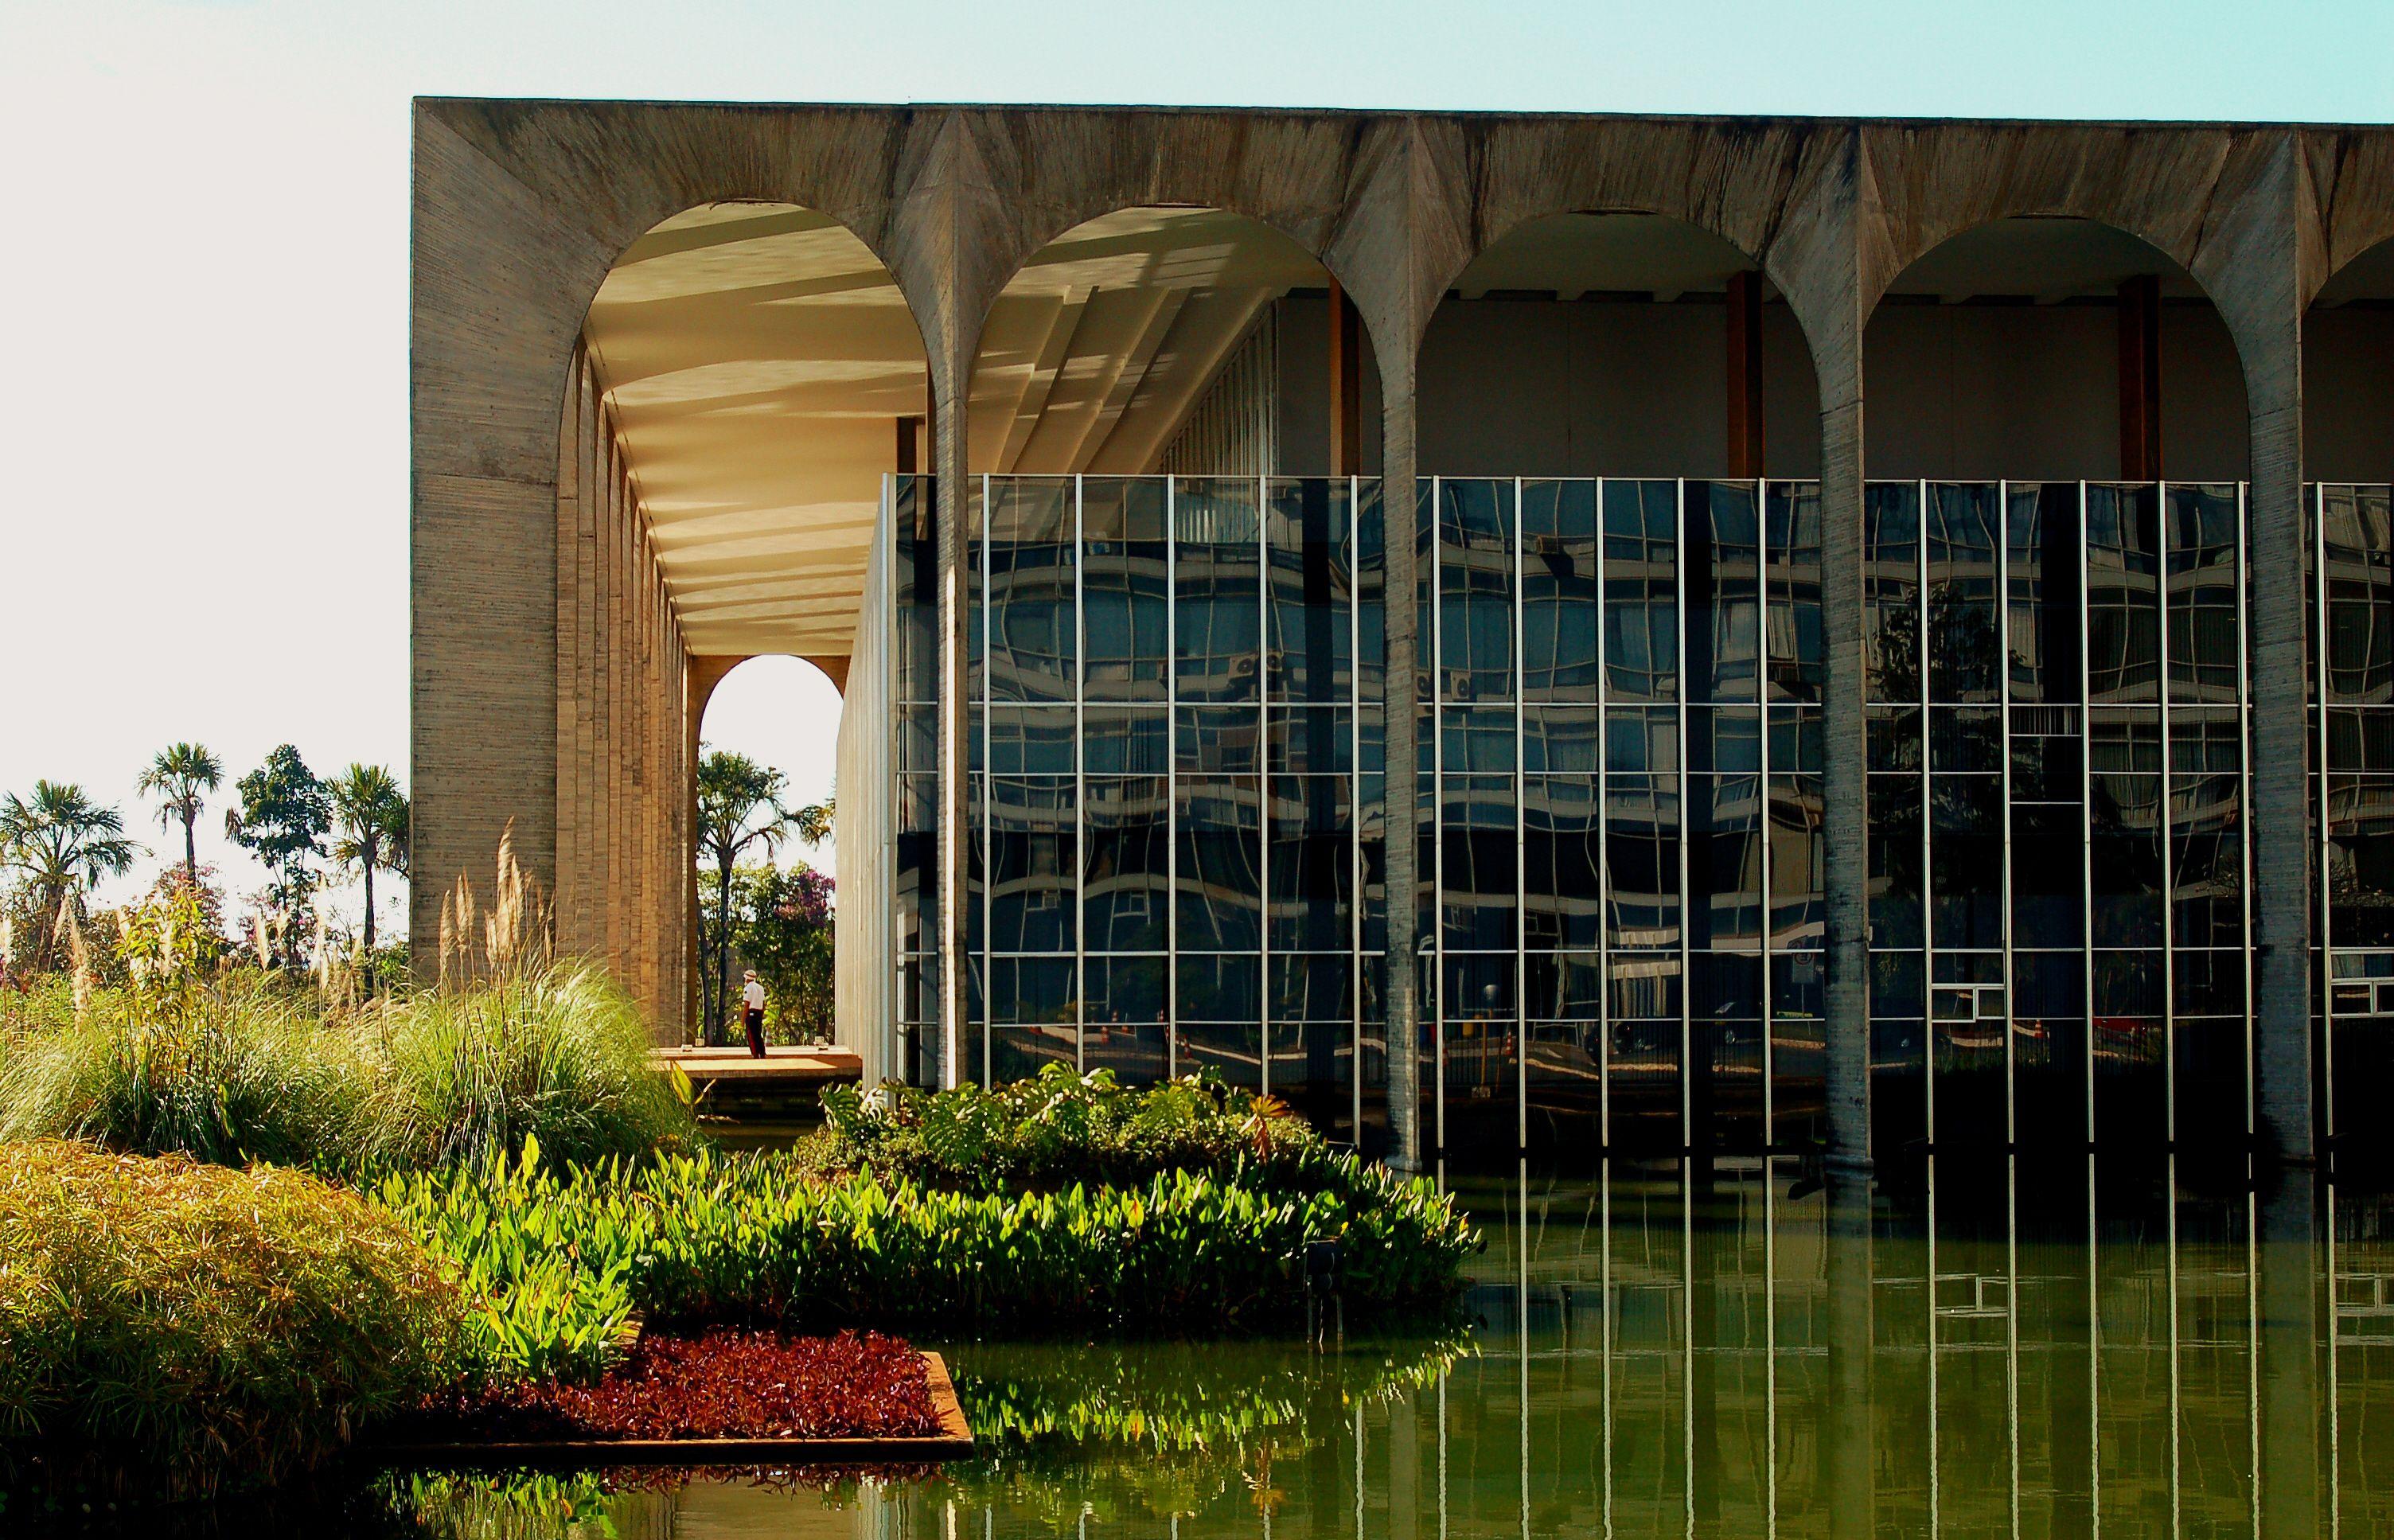 Palácio Itamaraty - Oscar Niemeyer / Brasília-Brasil